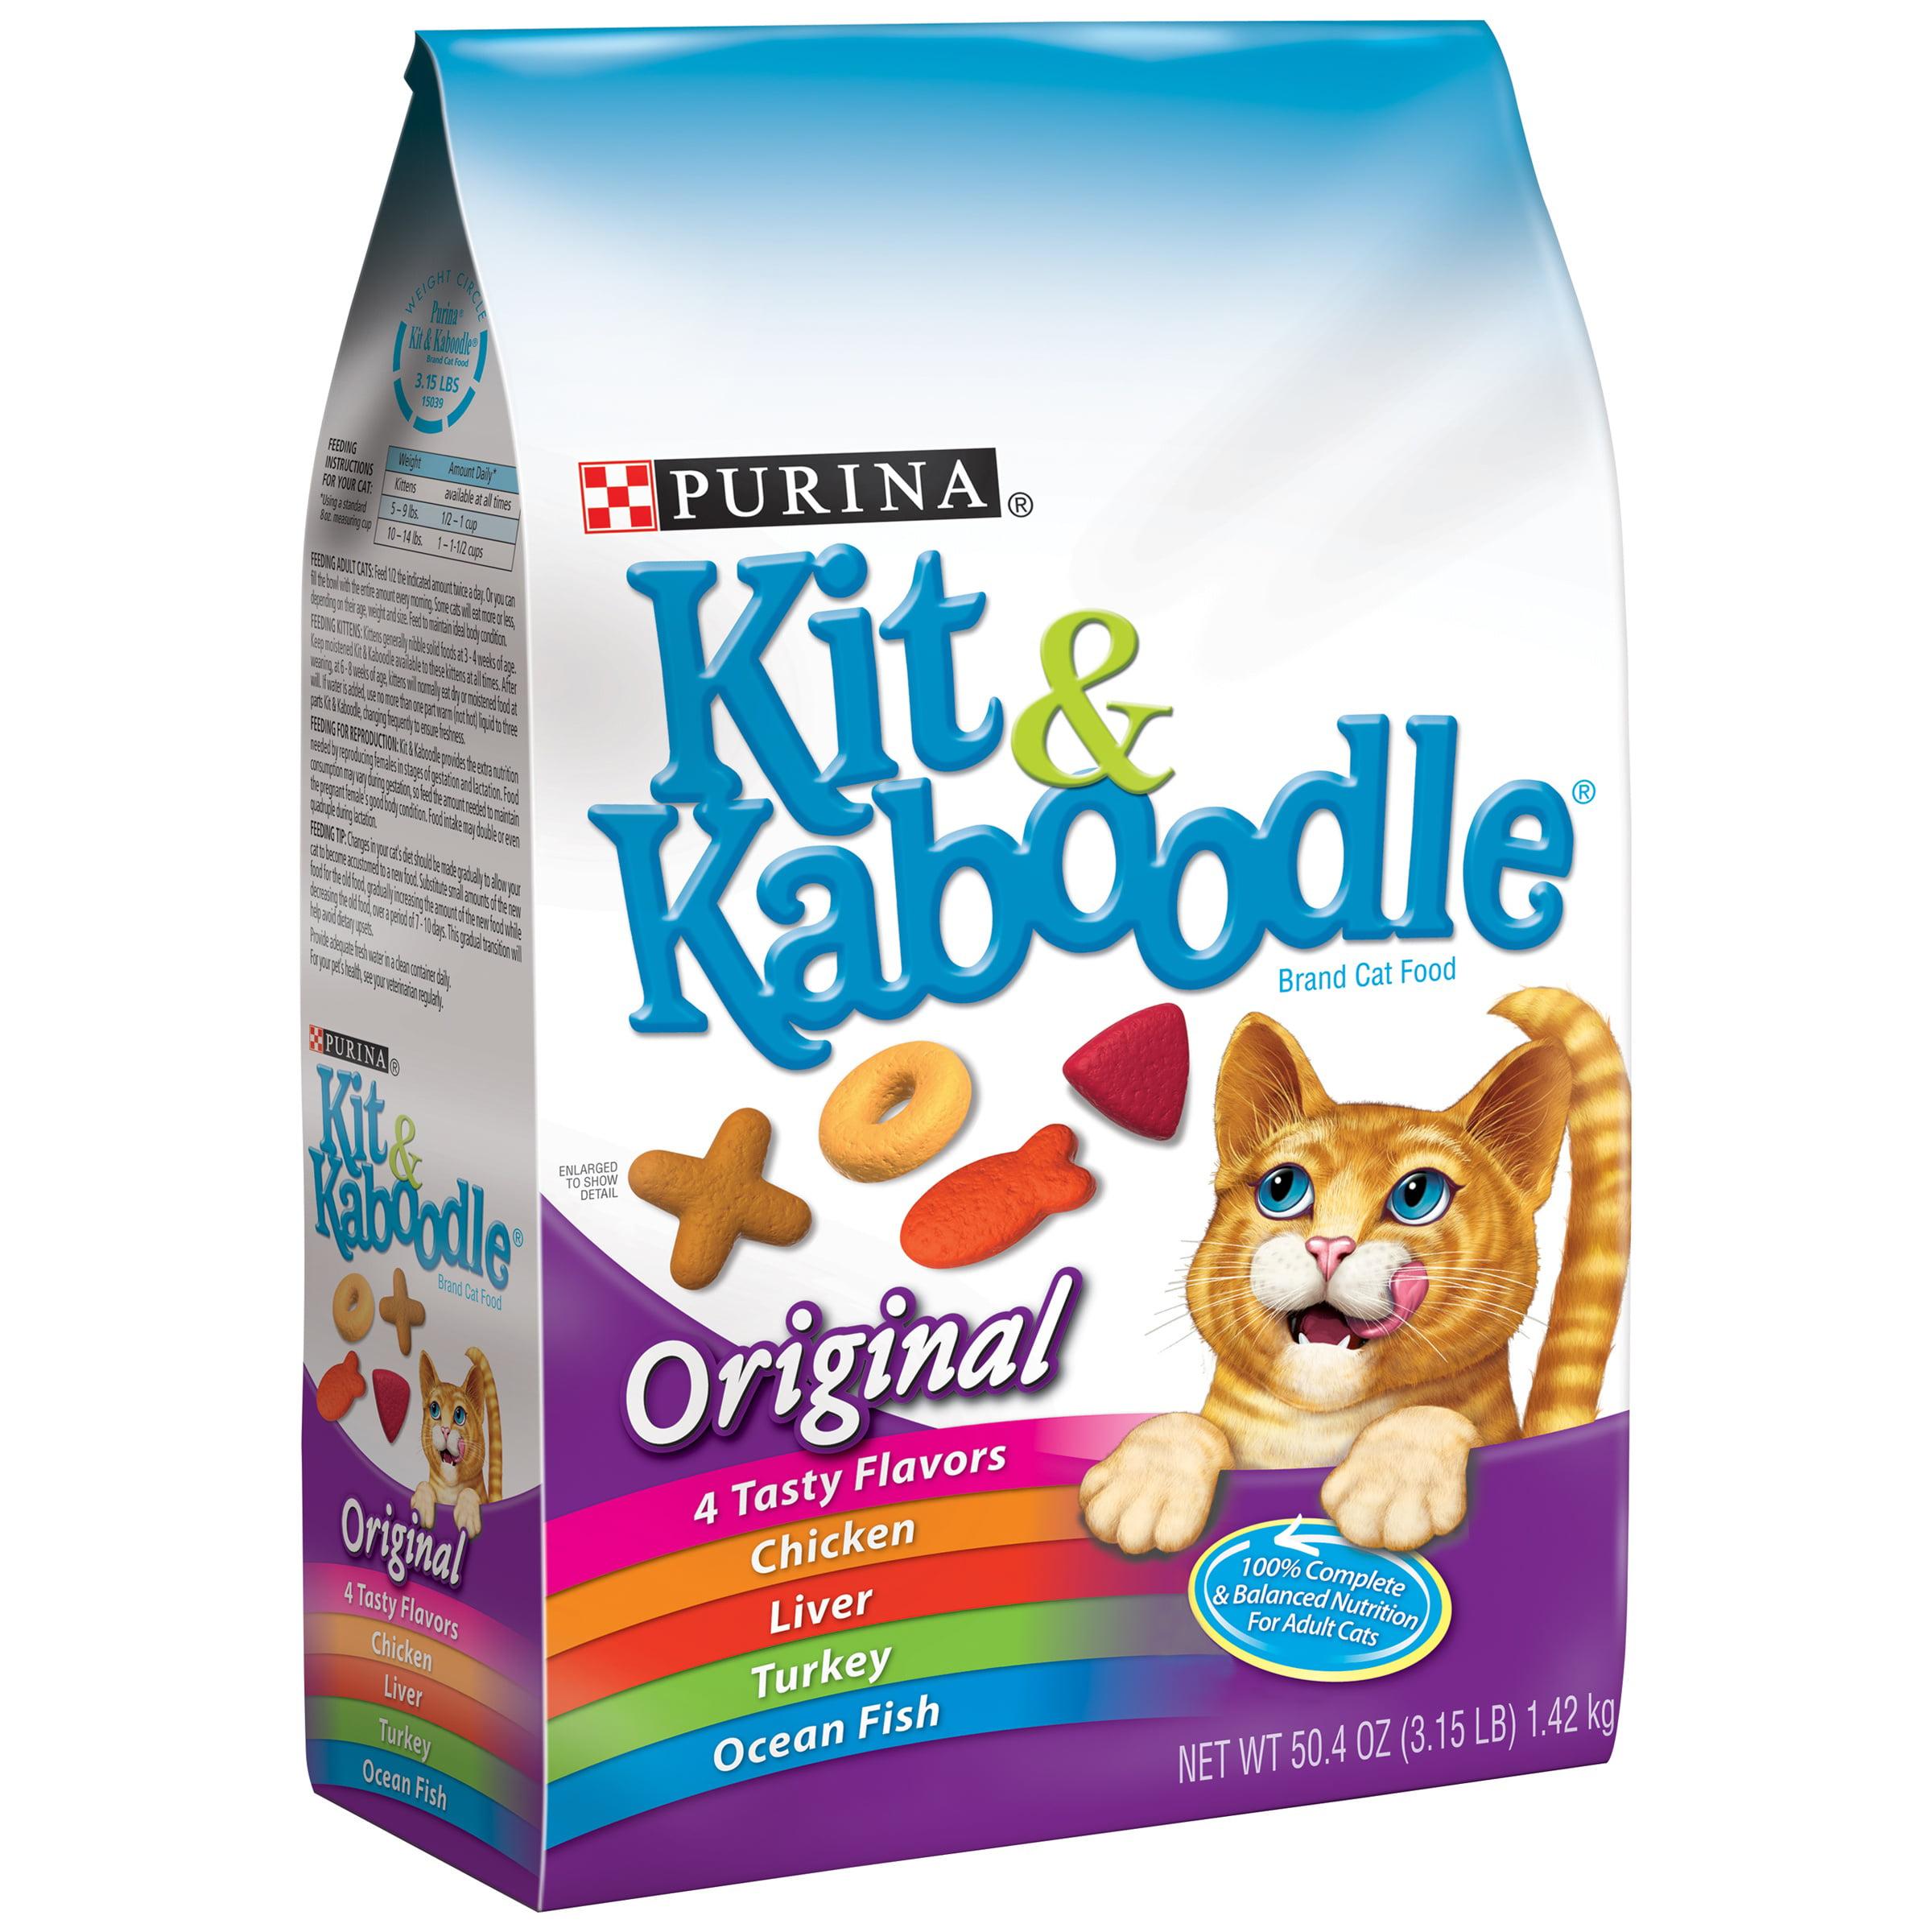 Purina Kit & Kaboodle Original Dry Cat Food, 3.15 lb - Walmart.com